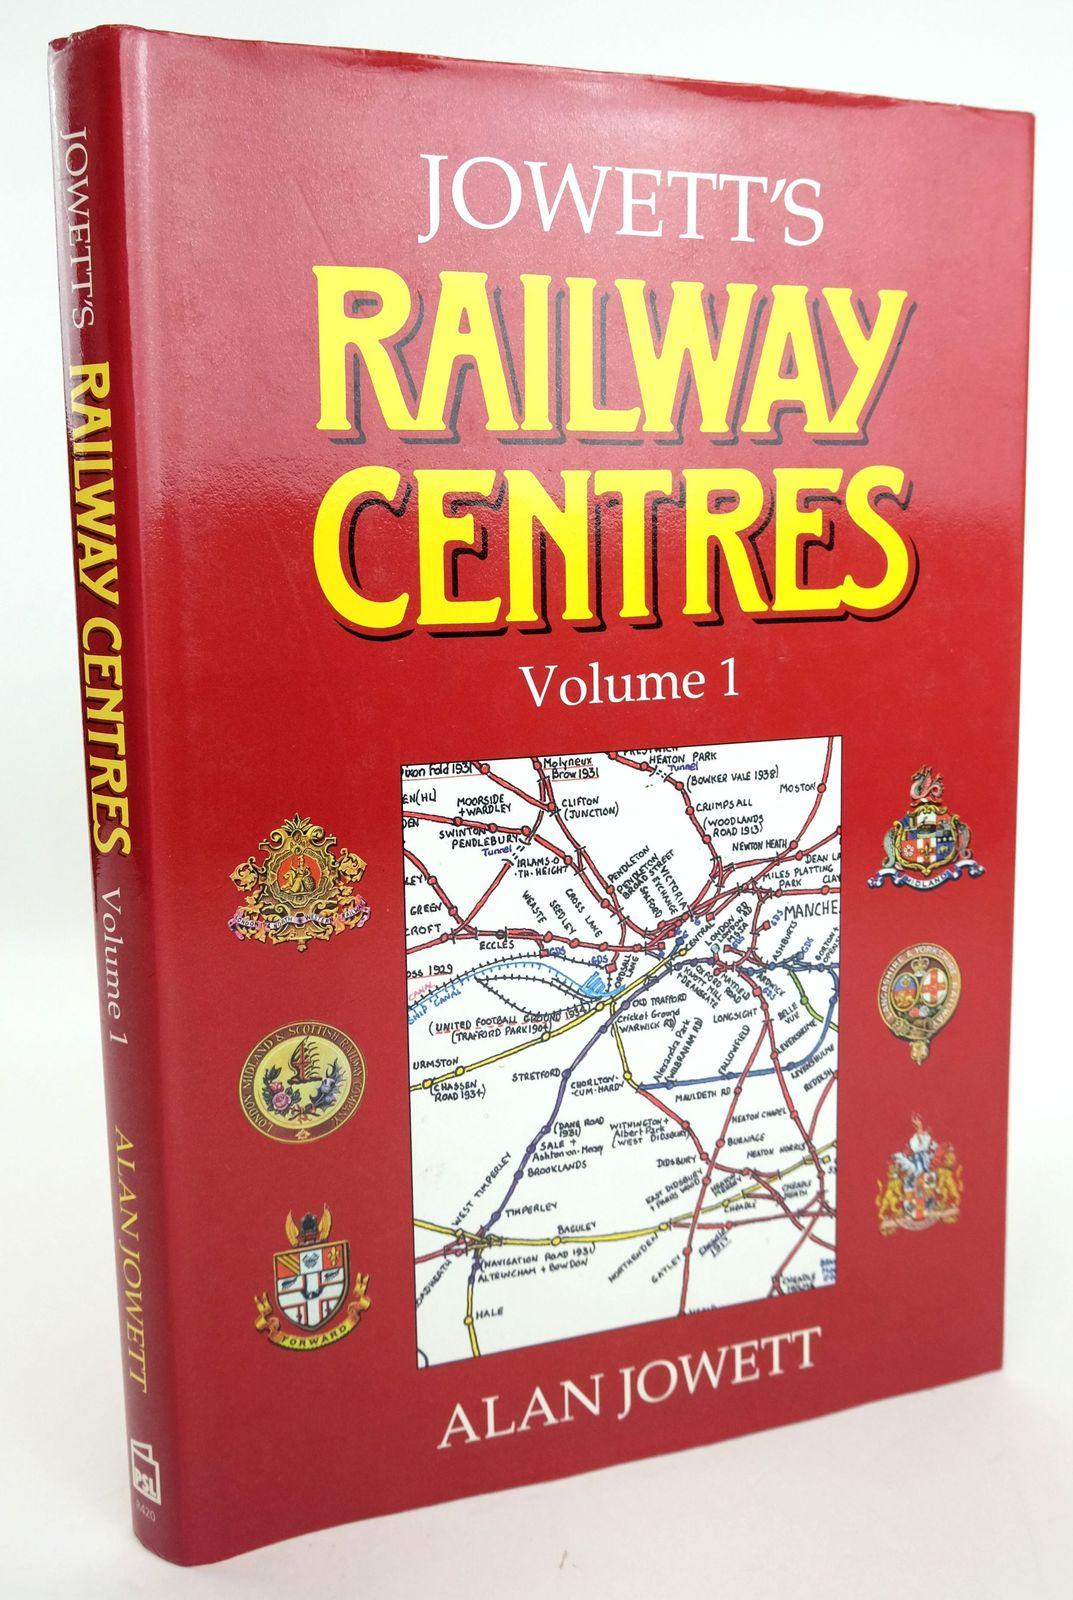 Photo of JOWETT'S RAILWAY CENTRES VOLUME 1- Stock Number: 1820153